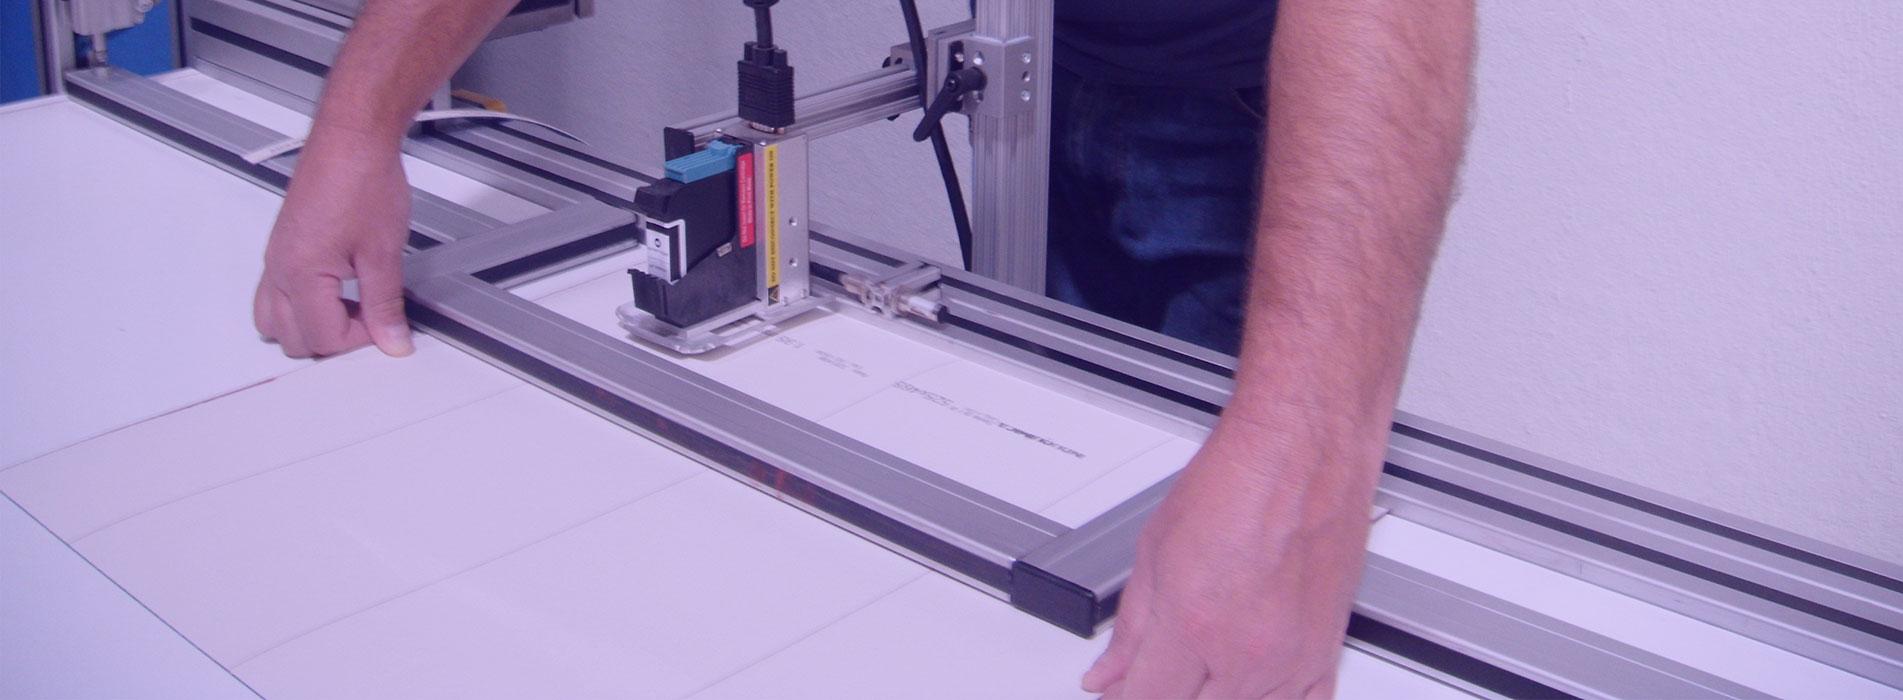 Printers Blankets ID